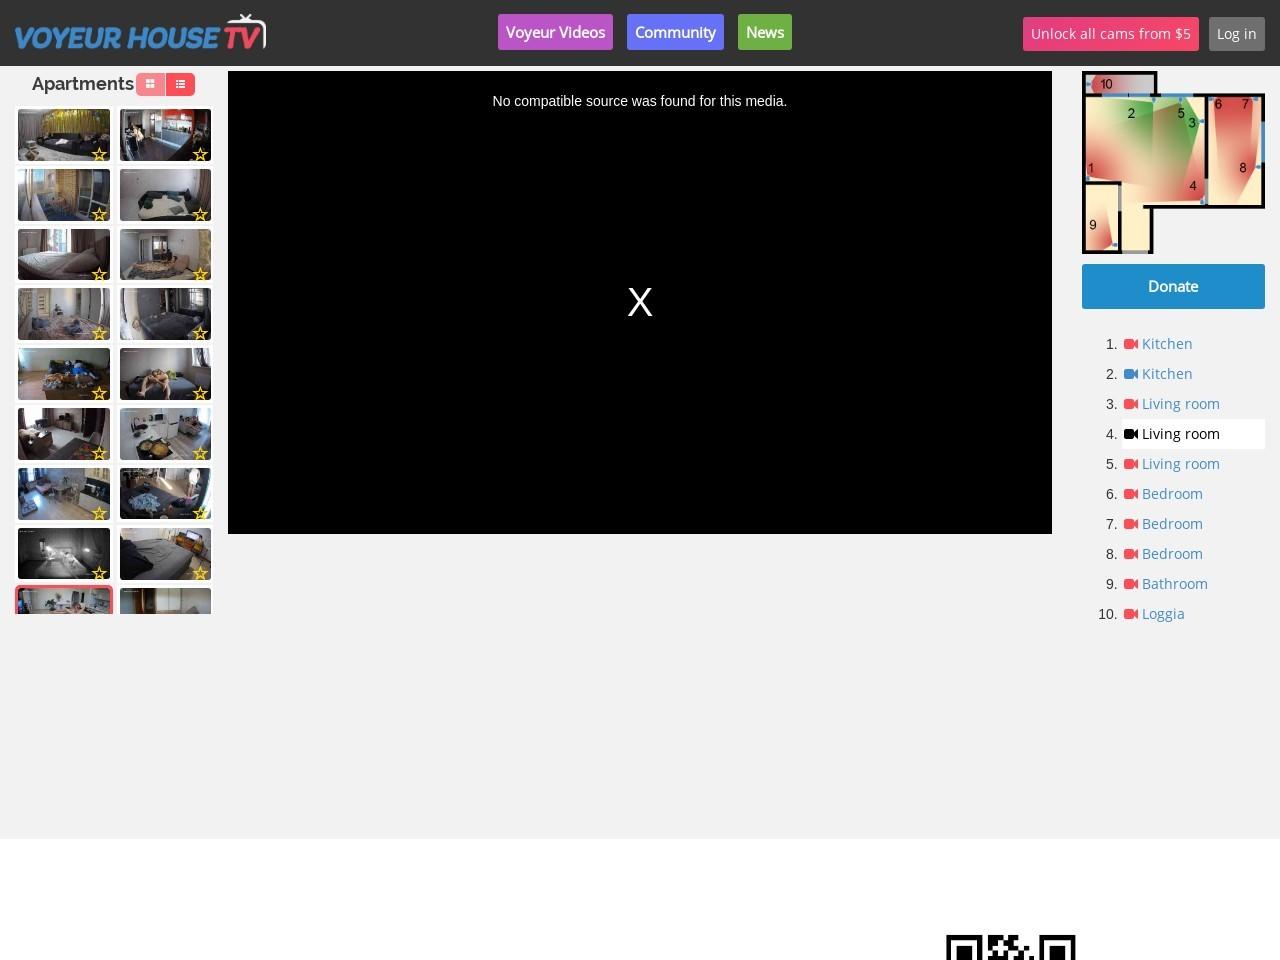 Voyeur House TV - #1 Source for hidden real life cams